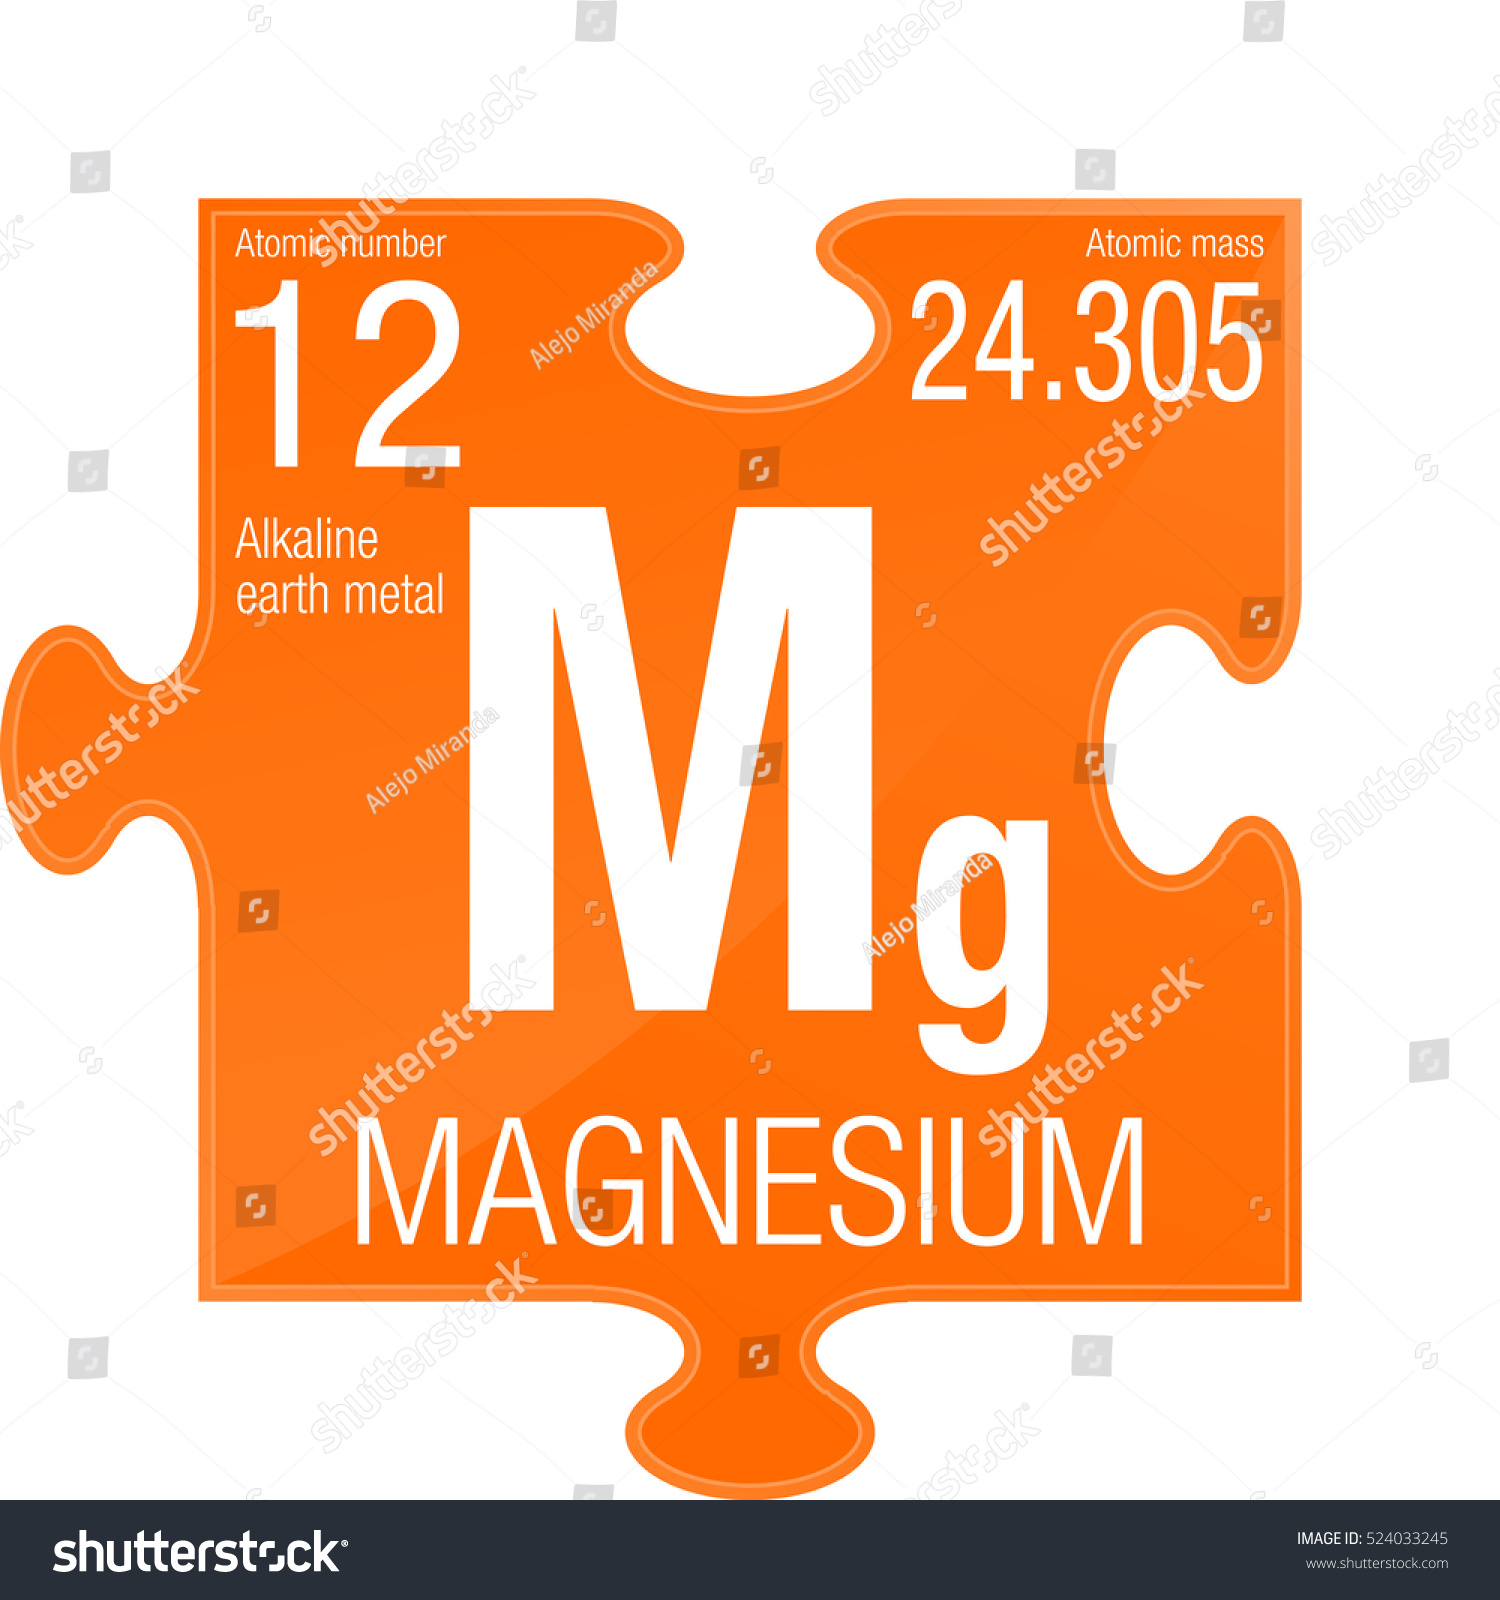 Magnesium symbol element number 12 periodic stock photo photo magnesium symbol element number 12 of the periodic table of the elements chemistry urtaz Gallery